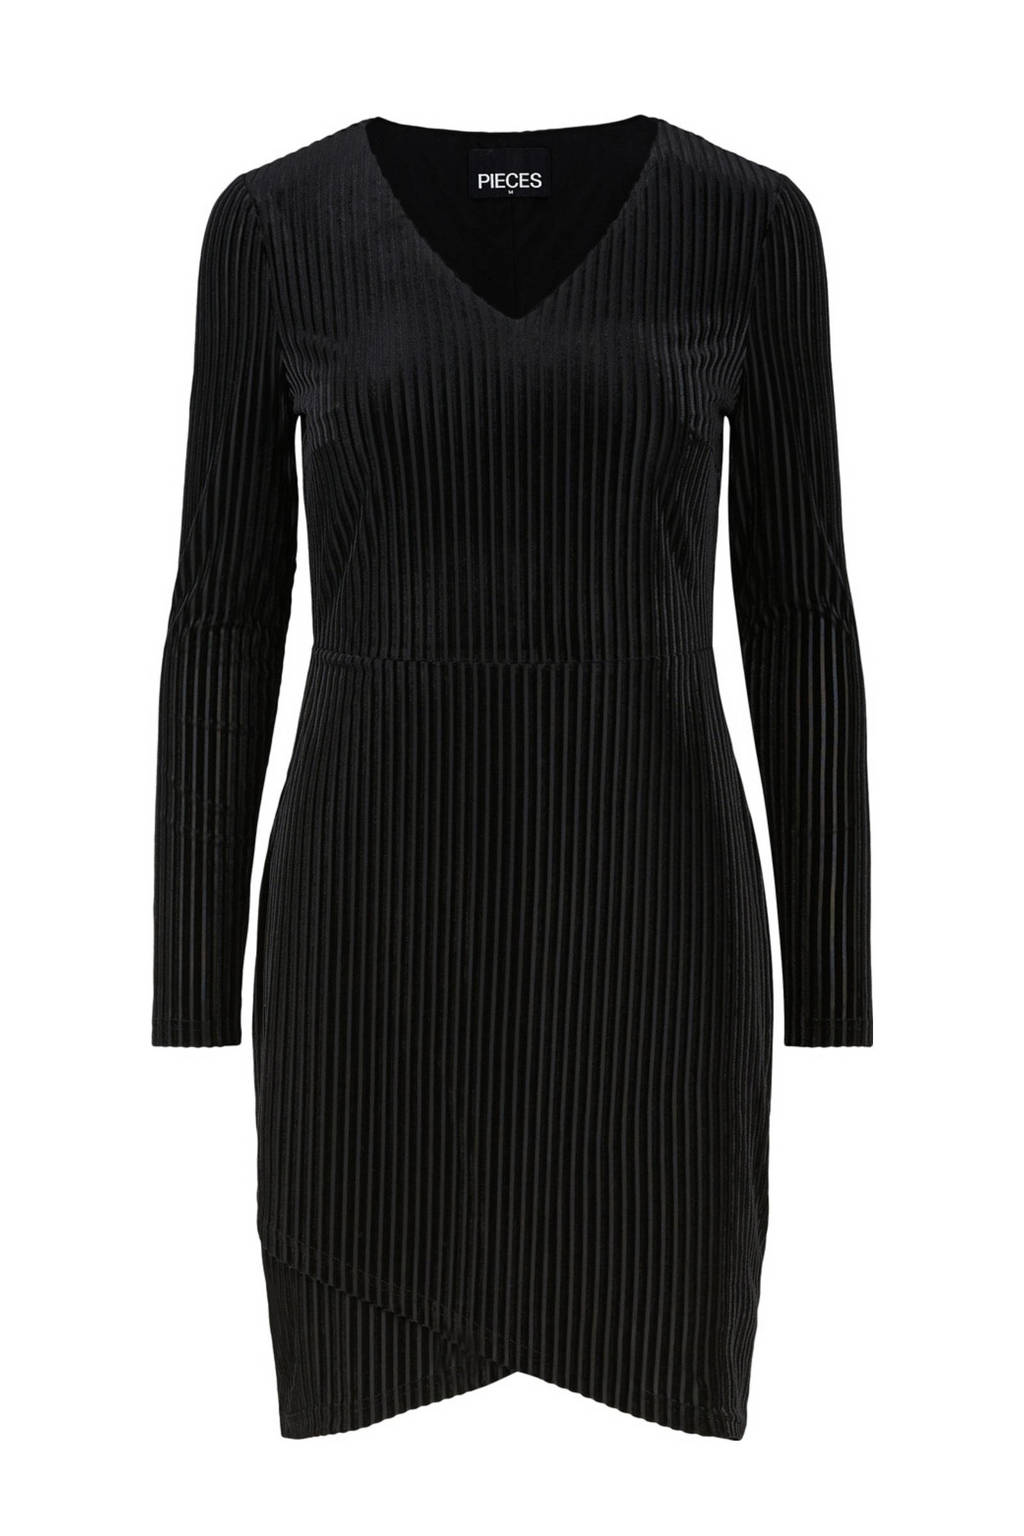 PIECES jurk PCPATTY zwart, Zwart